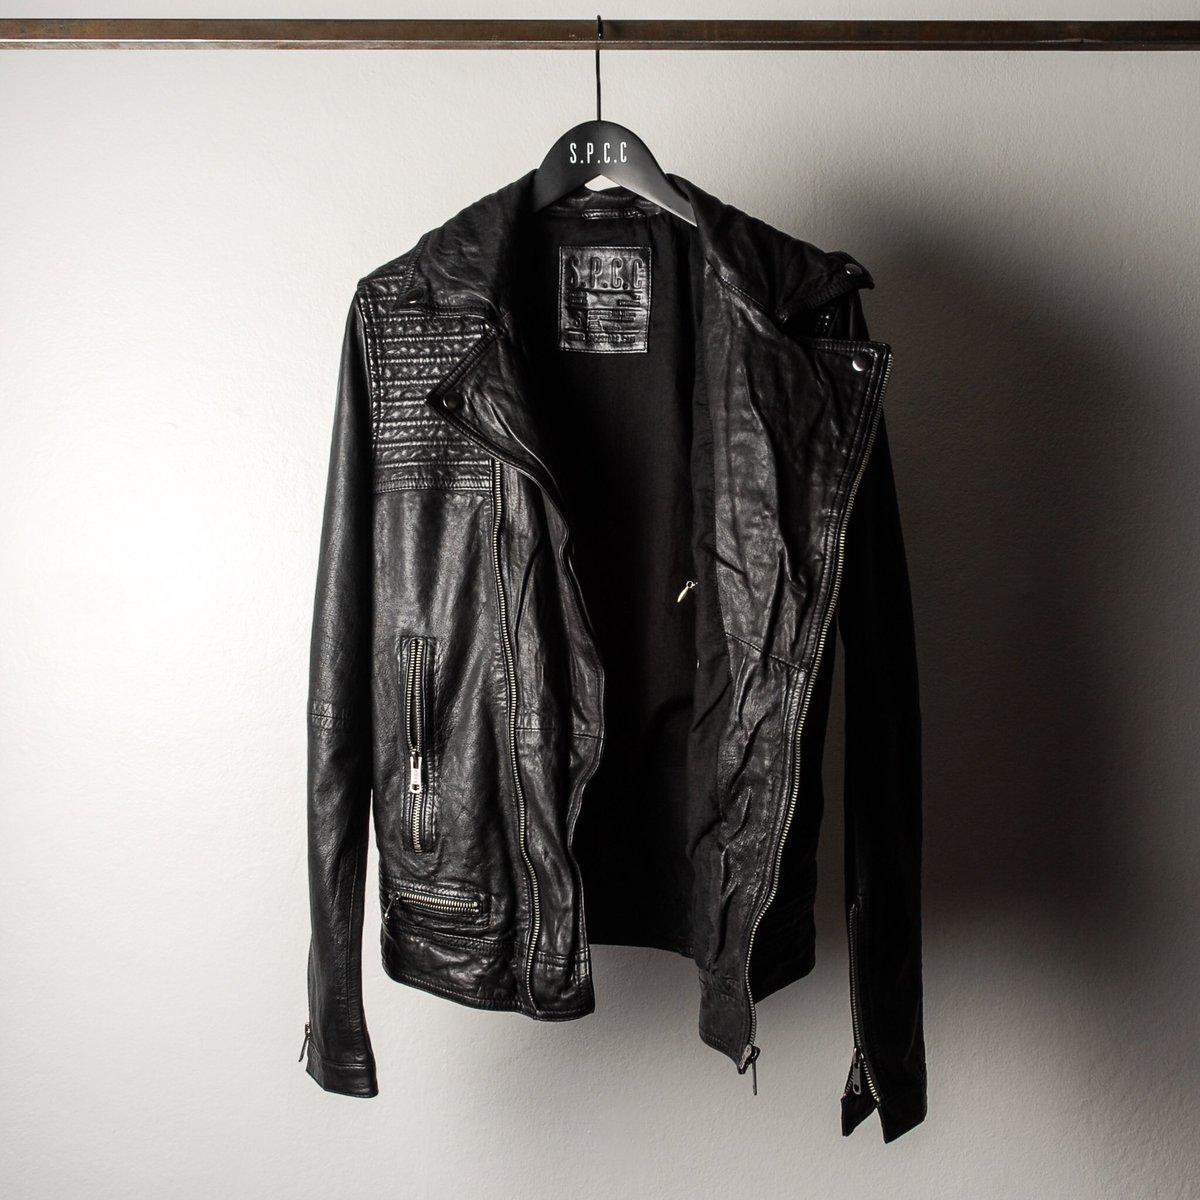 Leather jacket cape town - Love Warrior Kloof Online Lovewarrior Capetown Capetownfashion Kloofstreet Bloemfontein Spcc Leatherpic Twitter Com Mhon6gvkgn